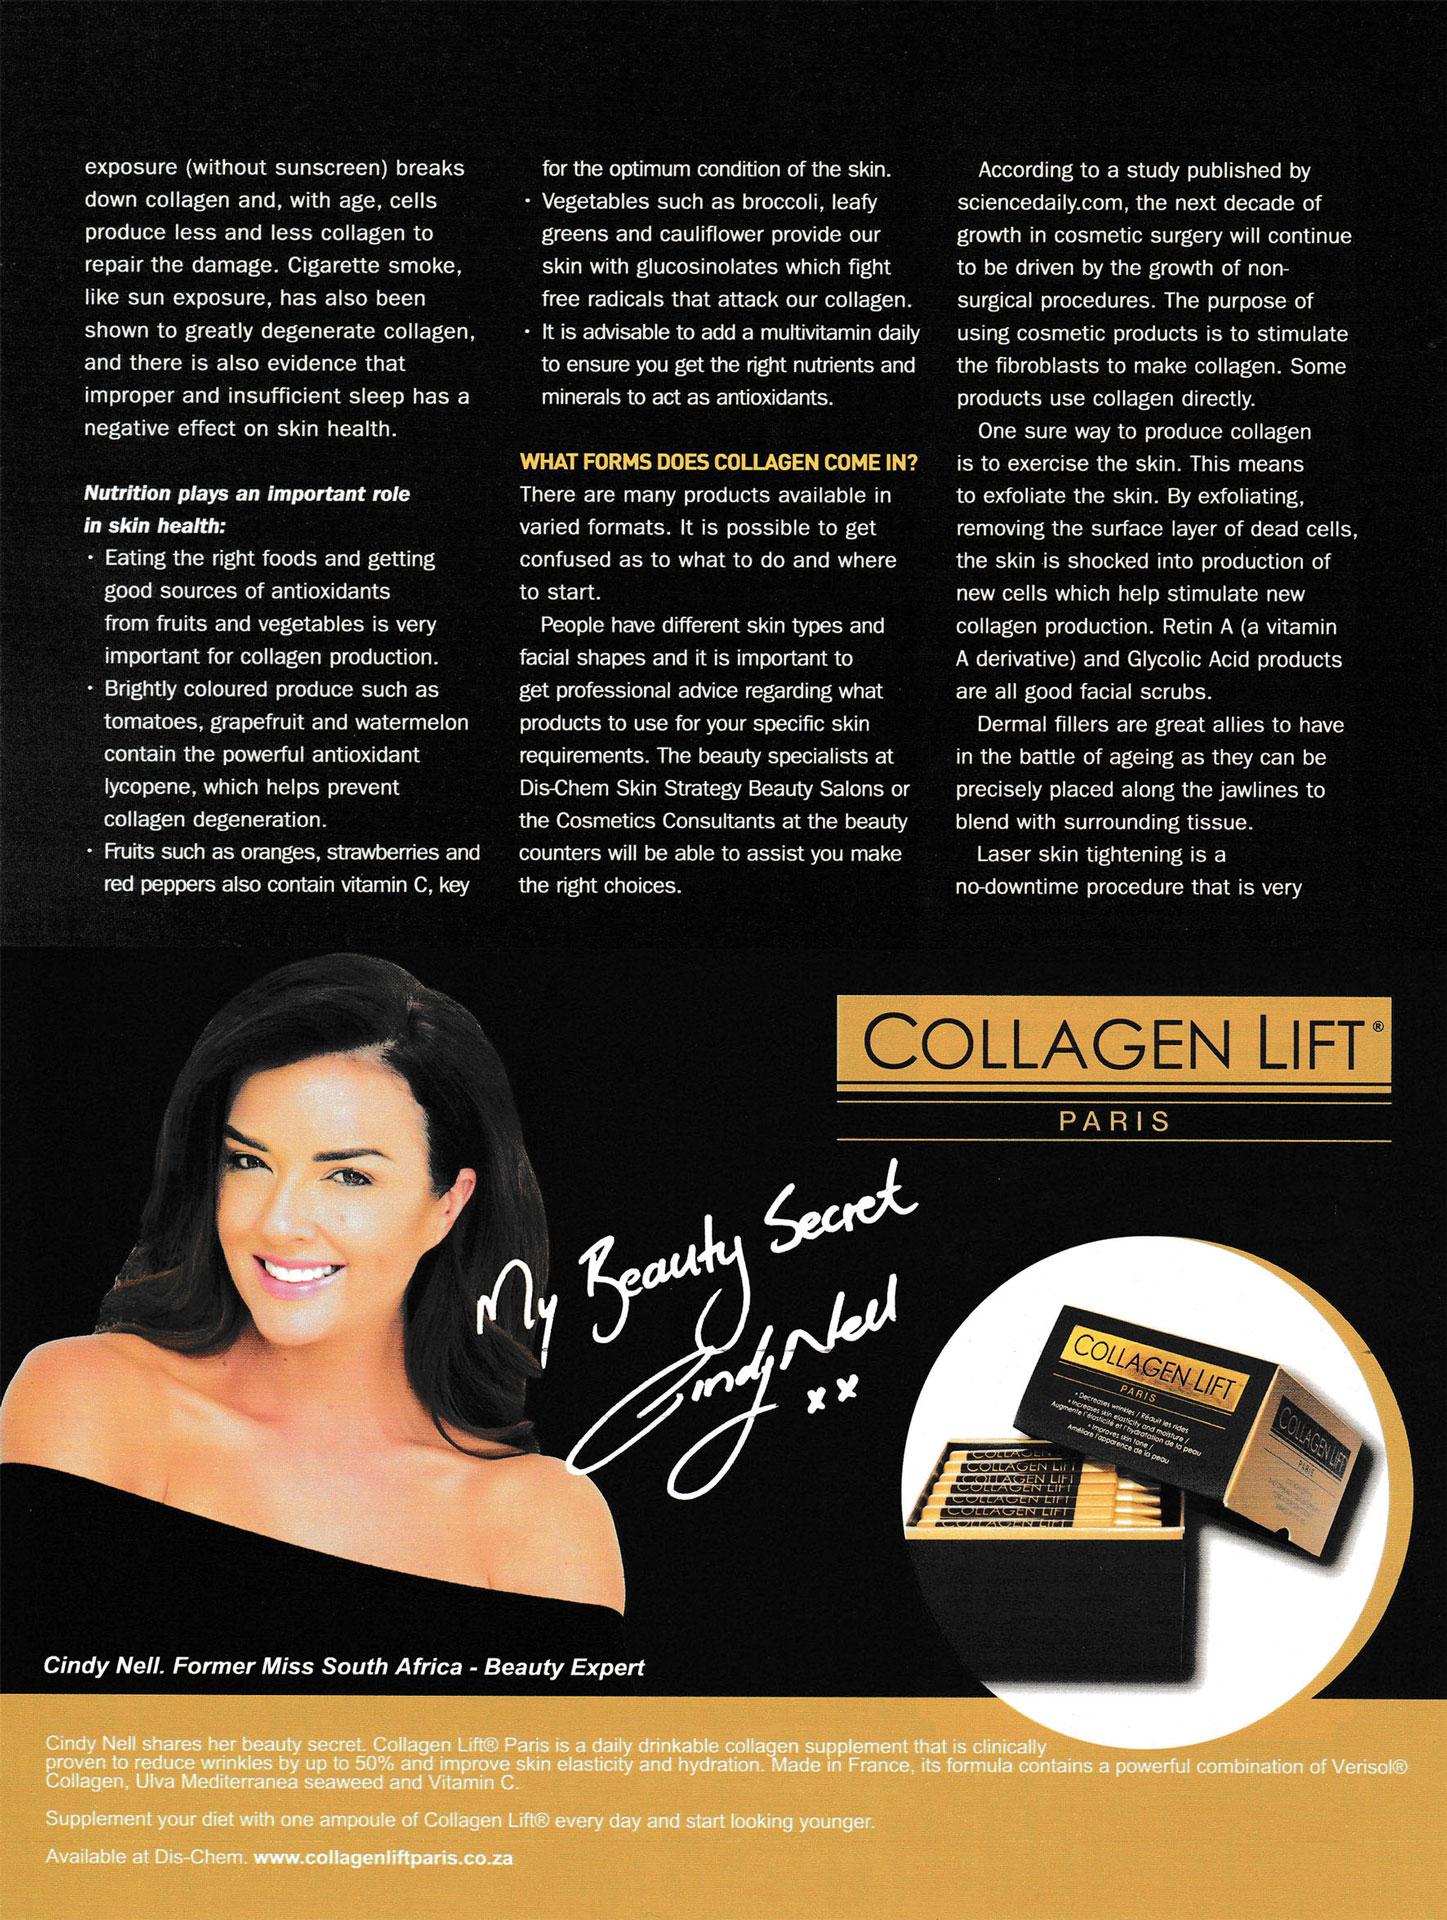 Collagen-Lift-Paris-DisChem-Benefits_0002 Media Release